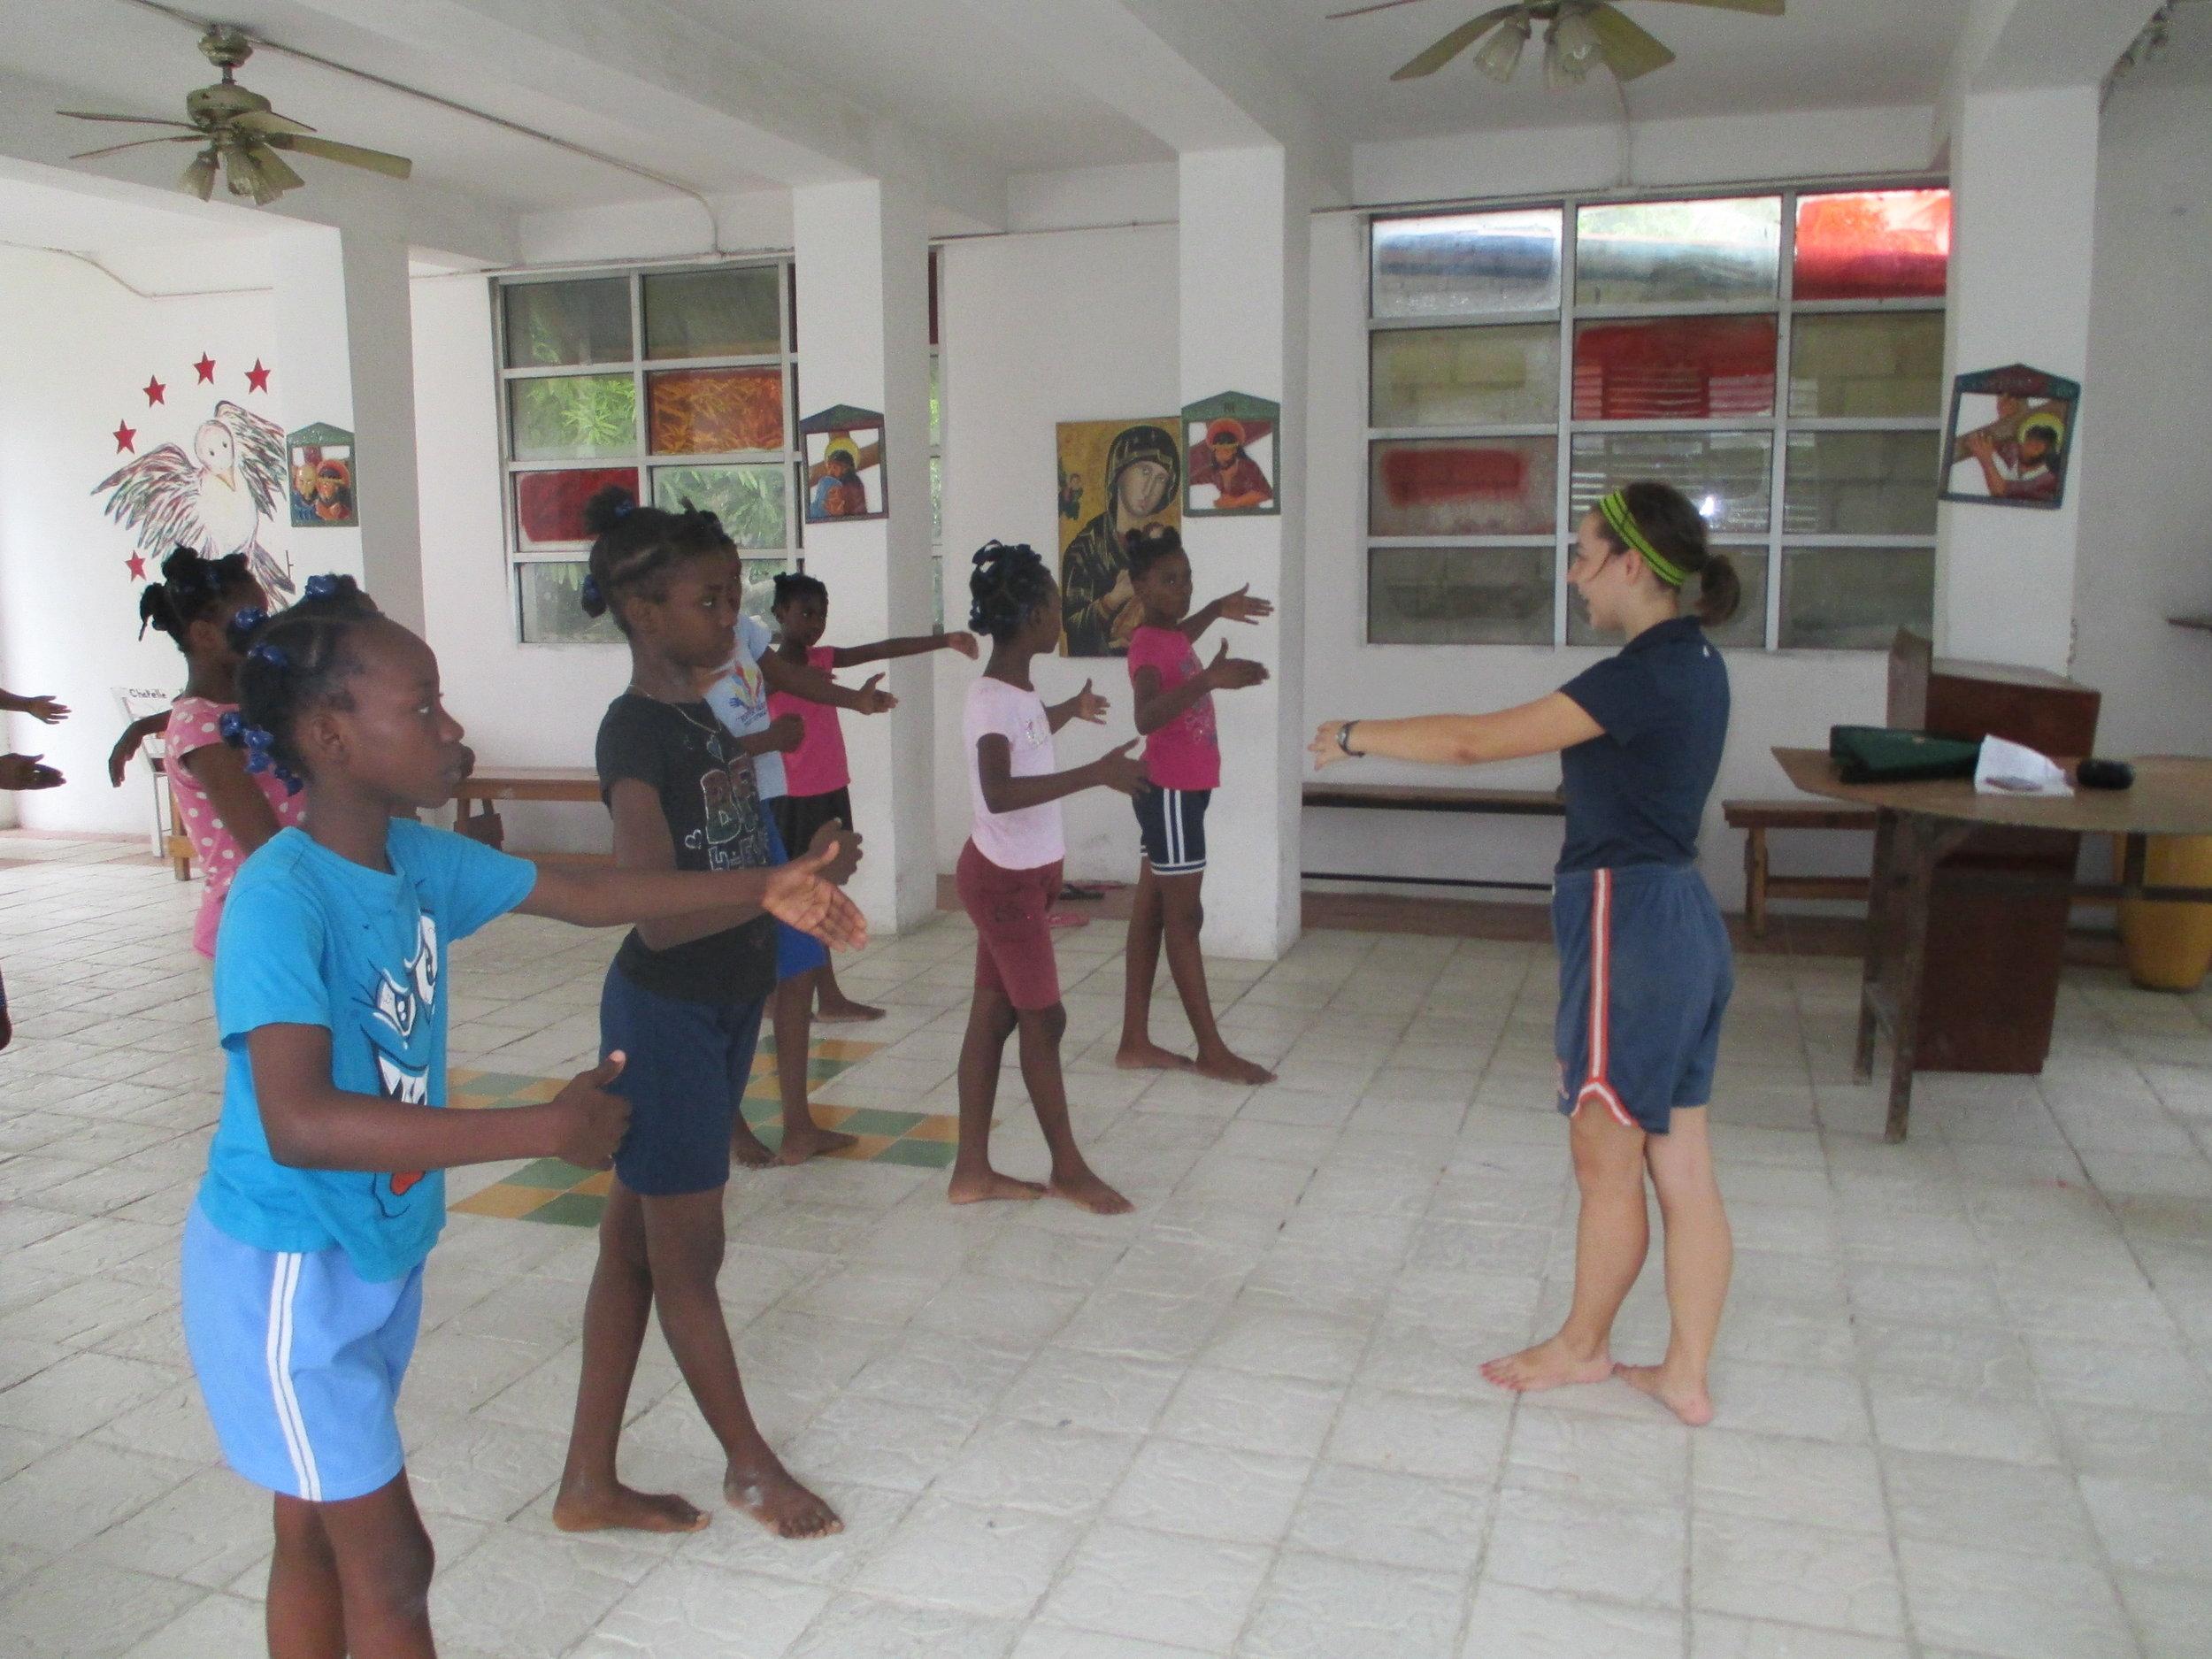 Volunteer Abigail Knapp leads Dance Club during Play Hour .